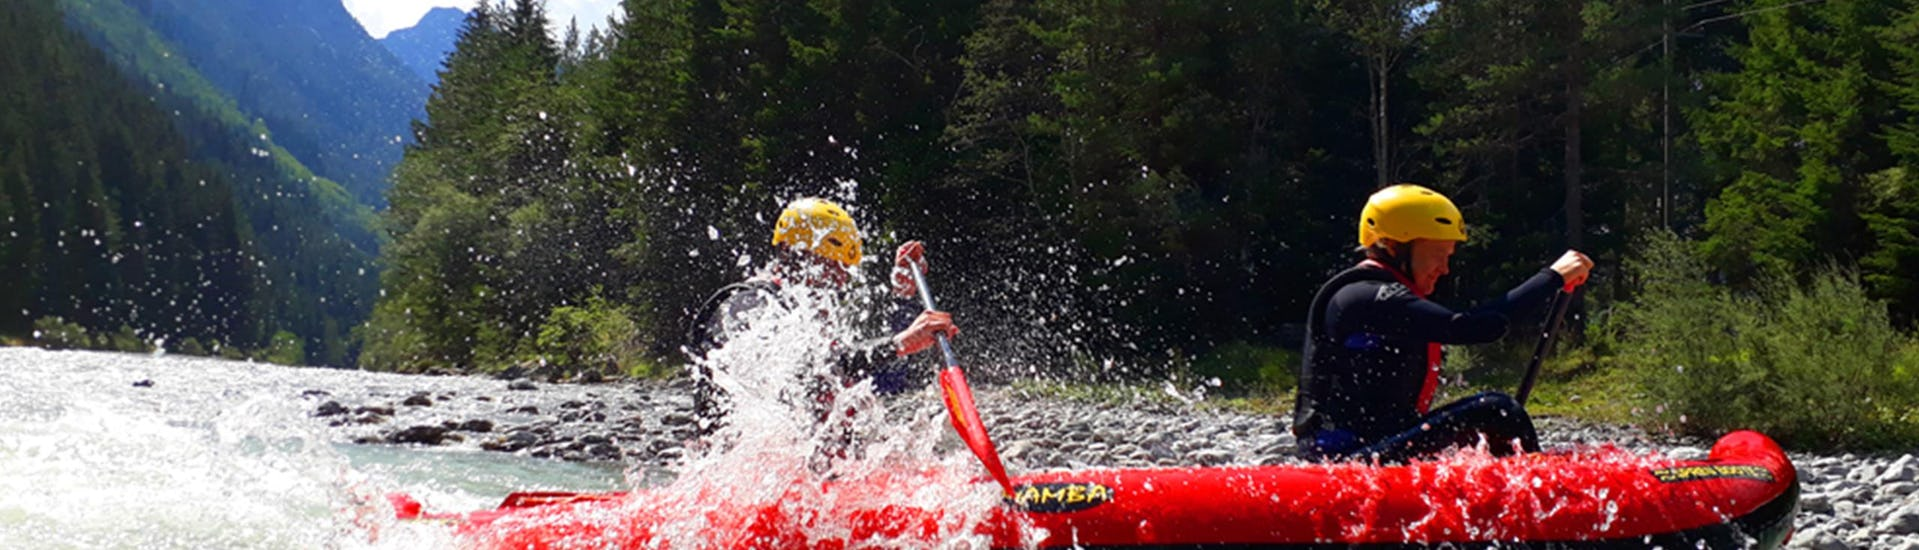 Rafting - Level 3 - Lech